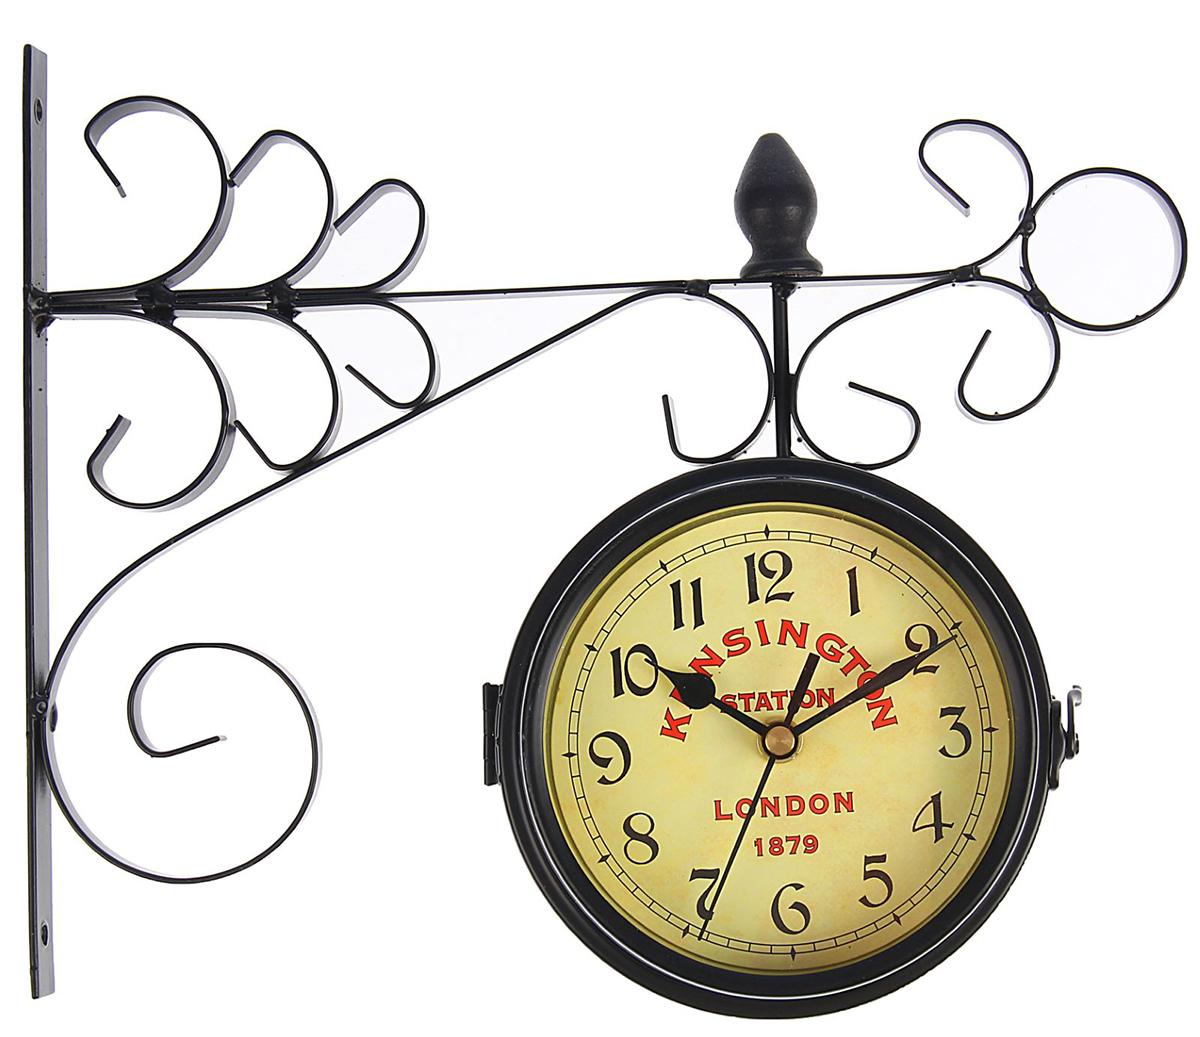 Часы настенные двойные Kinsington station, 24 х 30 см yihua 898d led digital 700w lead free smd desoldering soldering station hot air soldering station